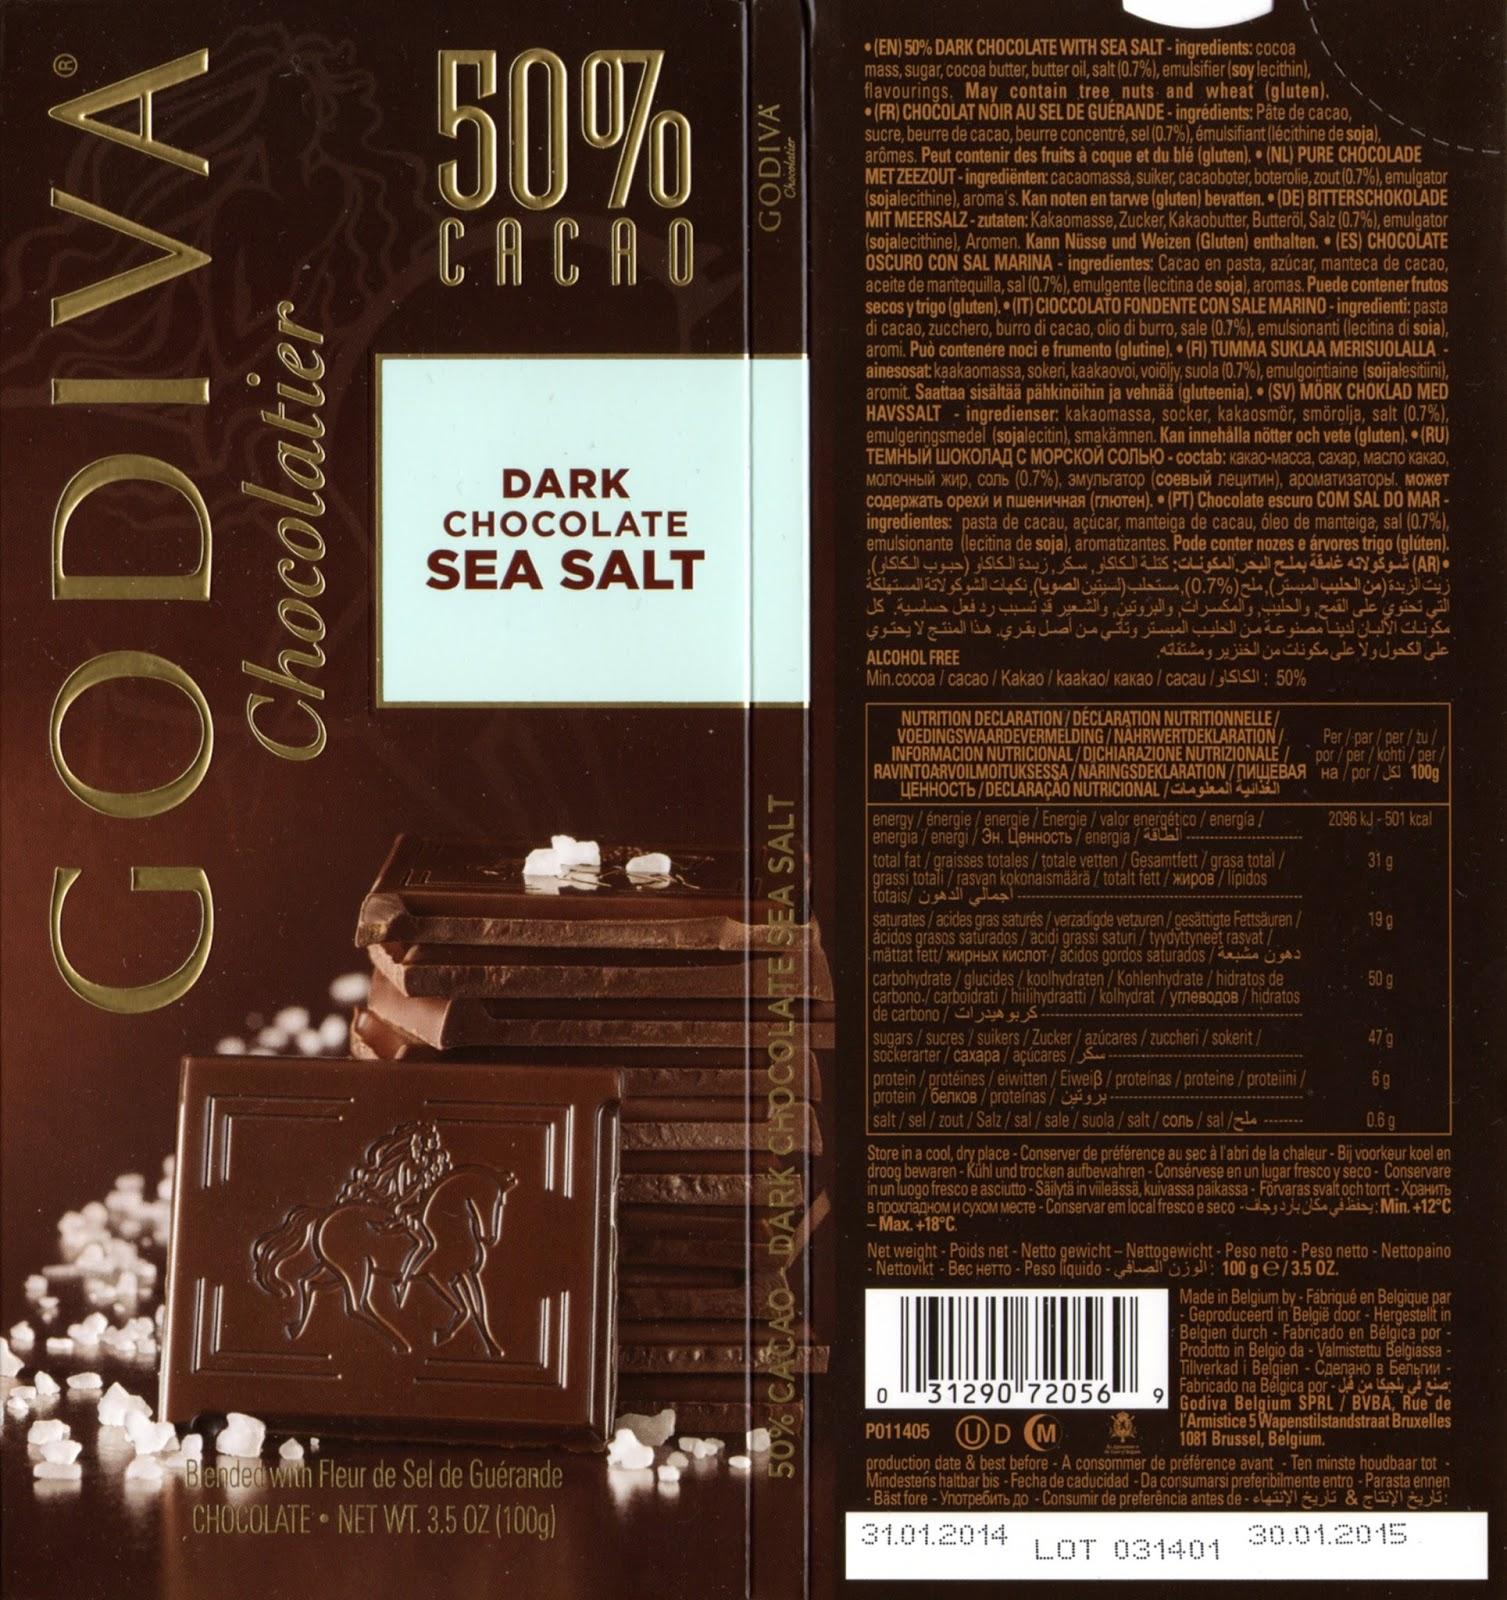 tablette de chocolat noir gourmand godiva noir au sel de guérande